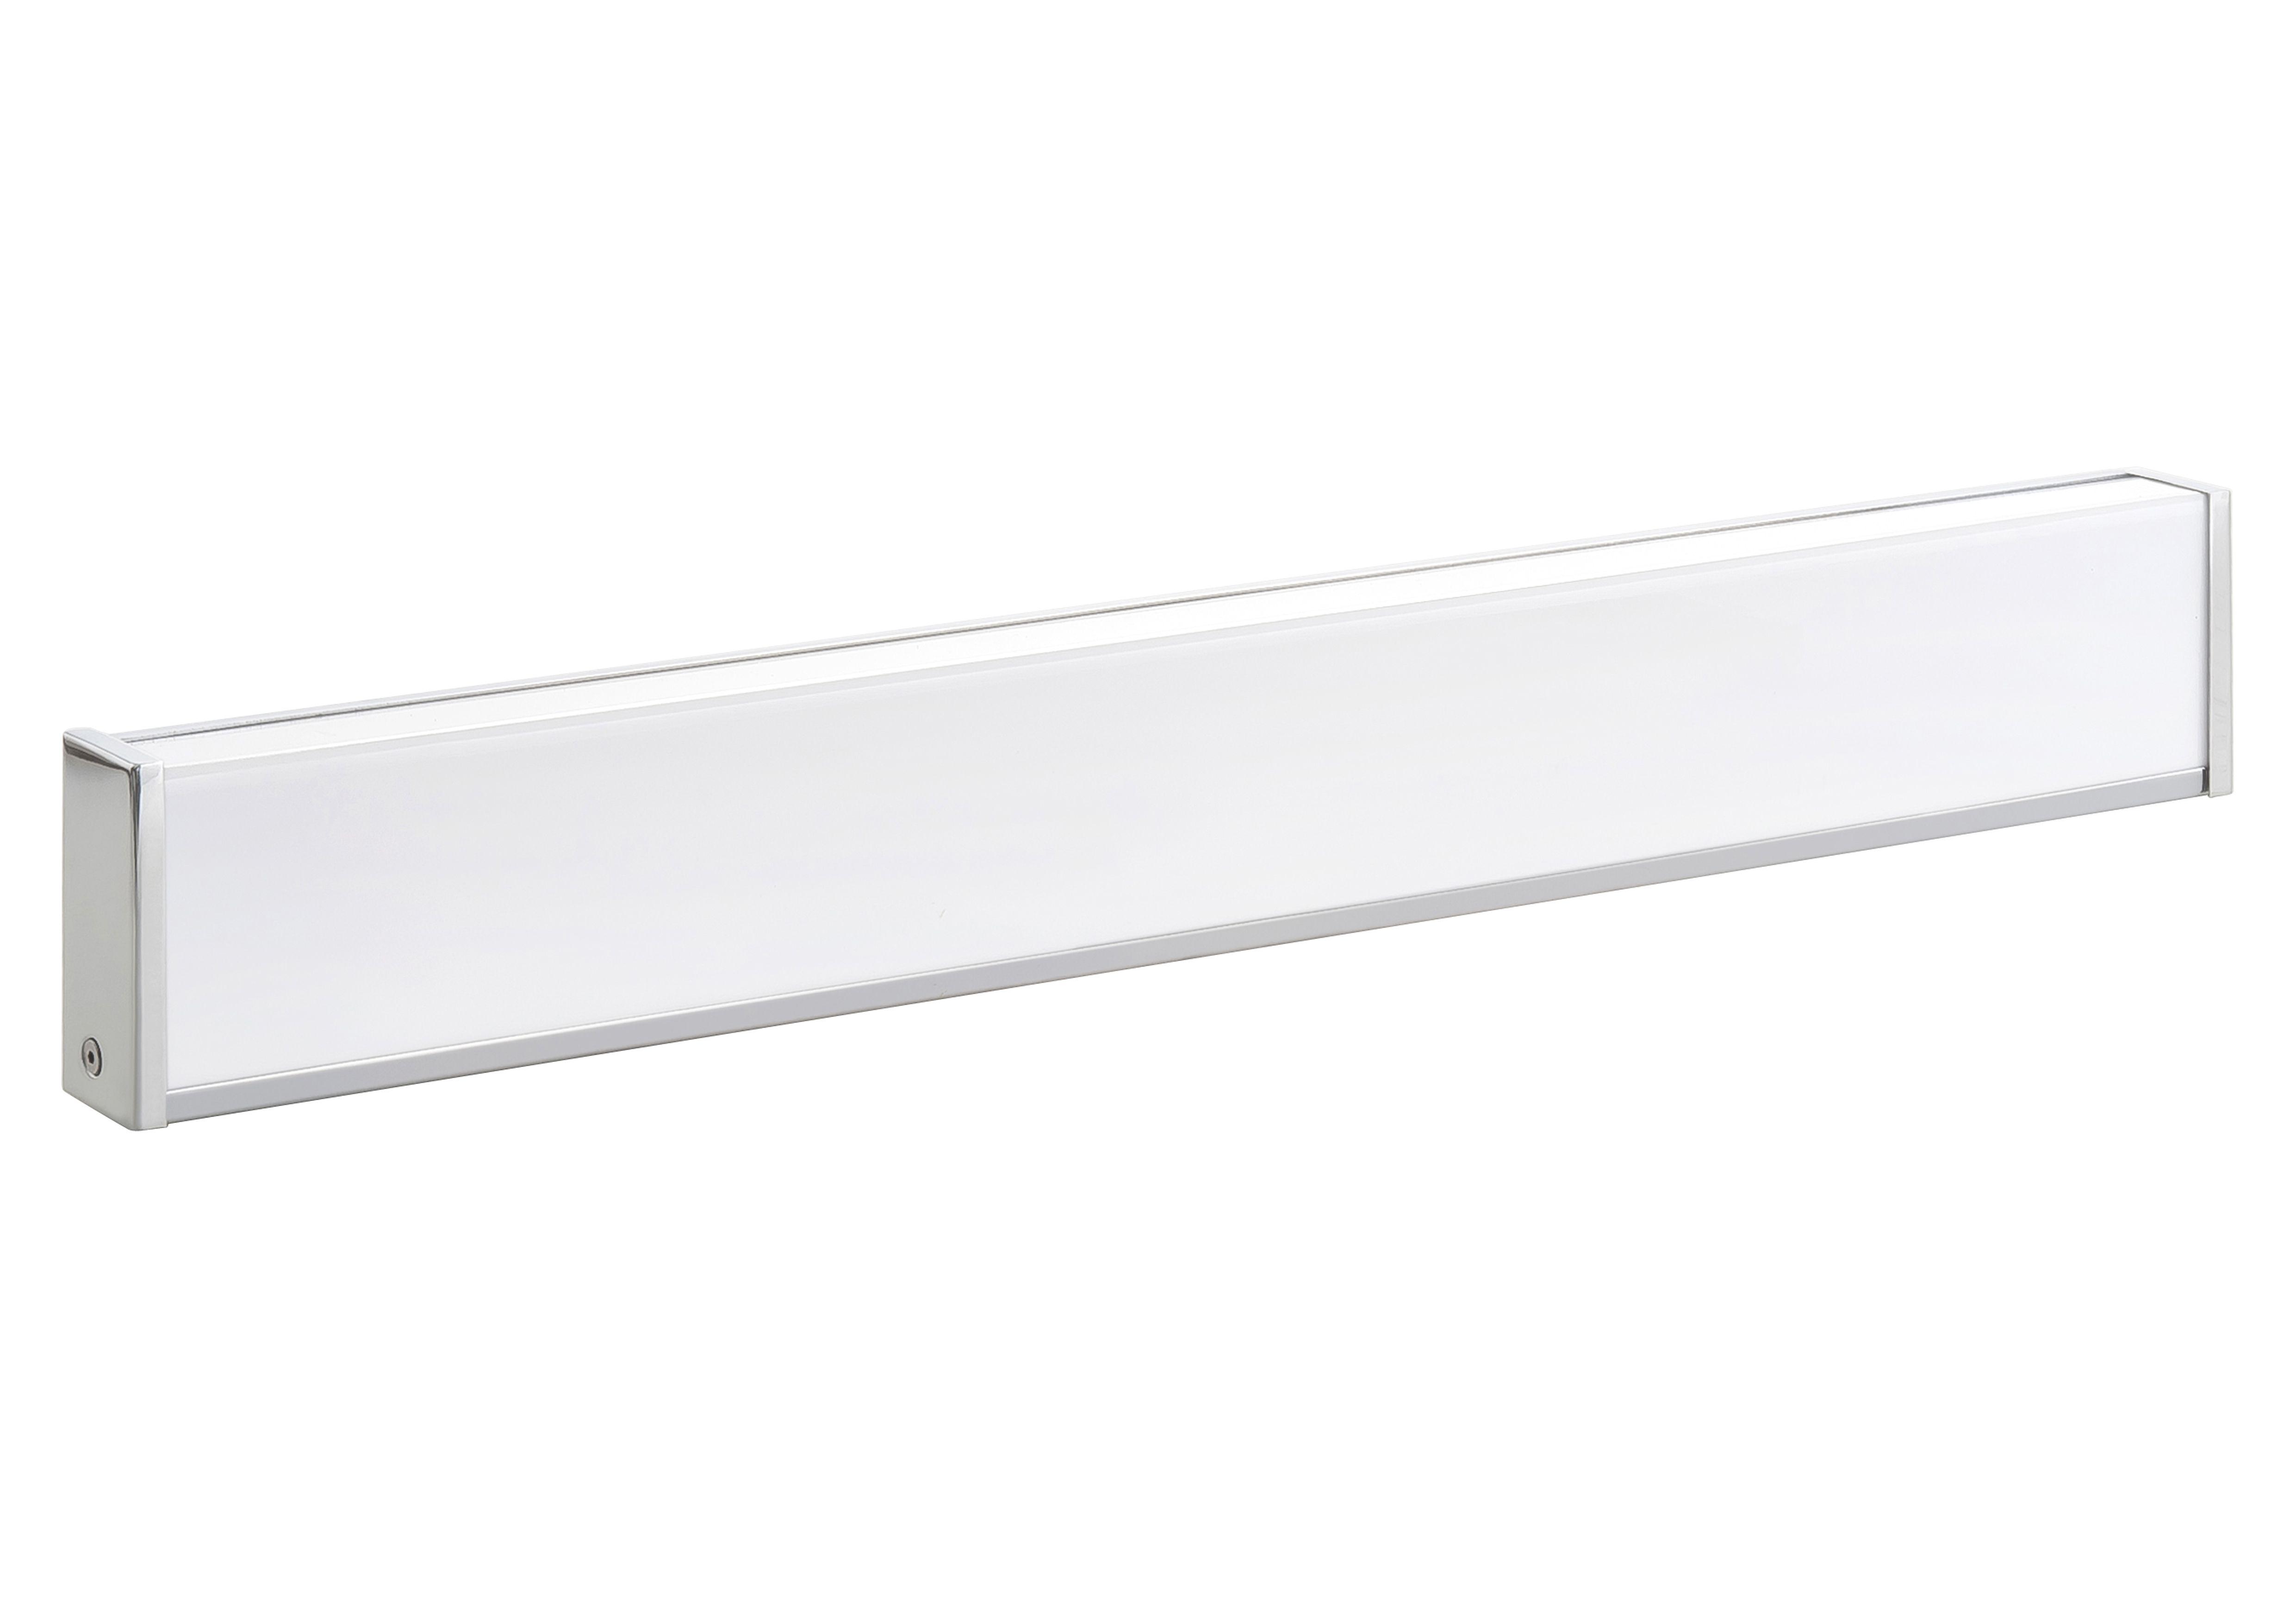 HighLight badkamer wandlamp Function 59 - chroom